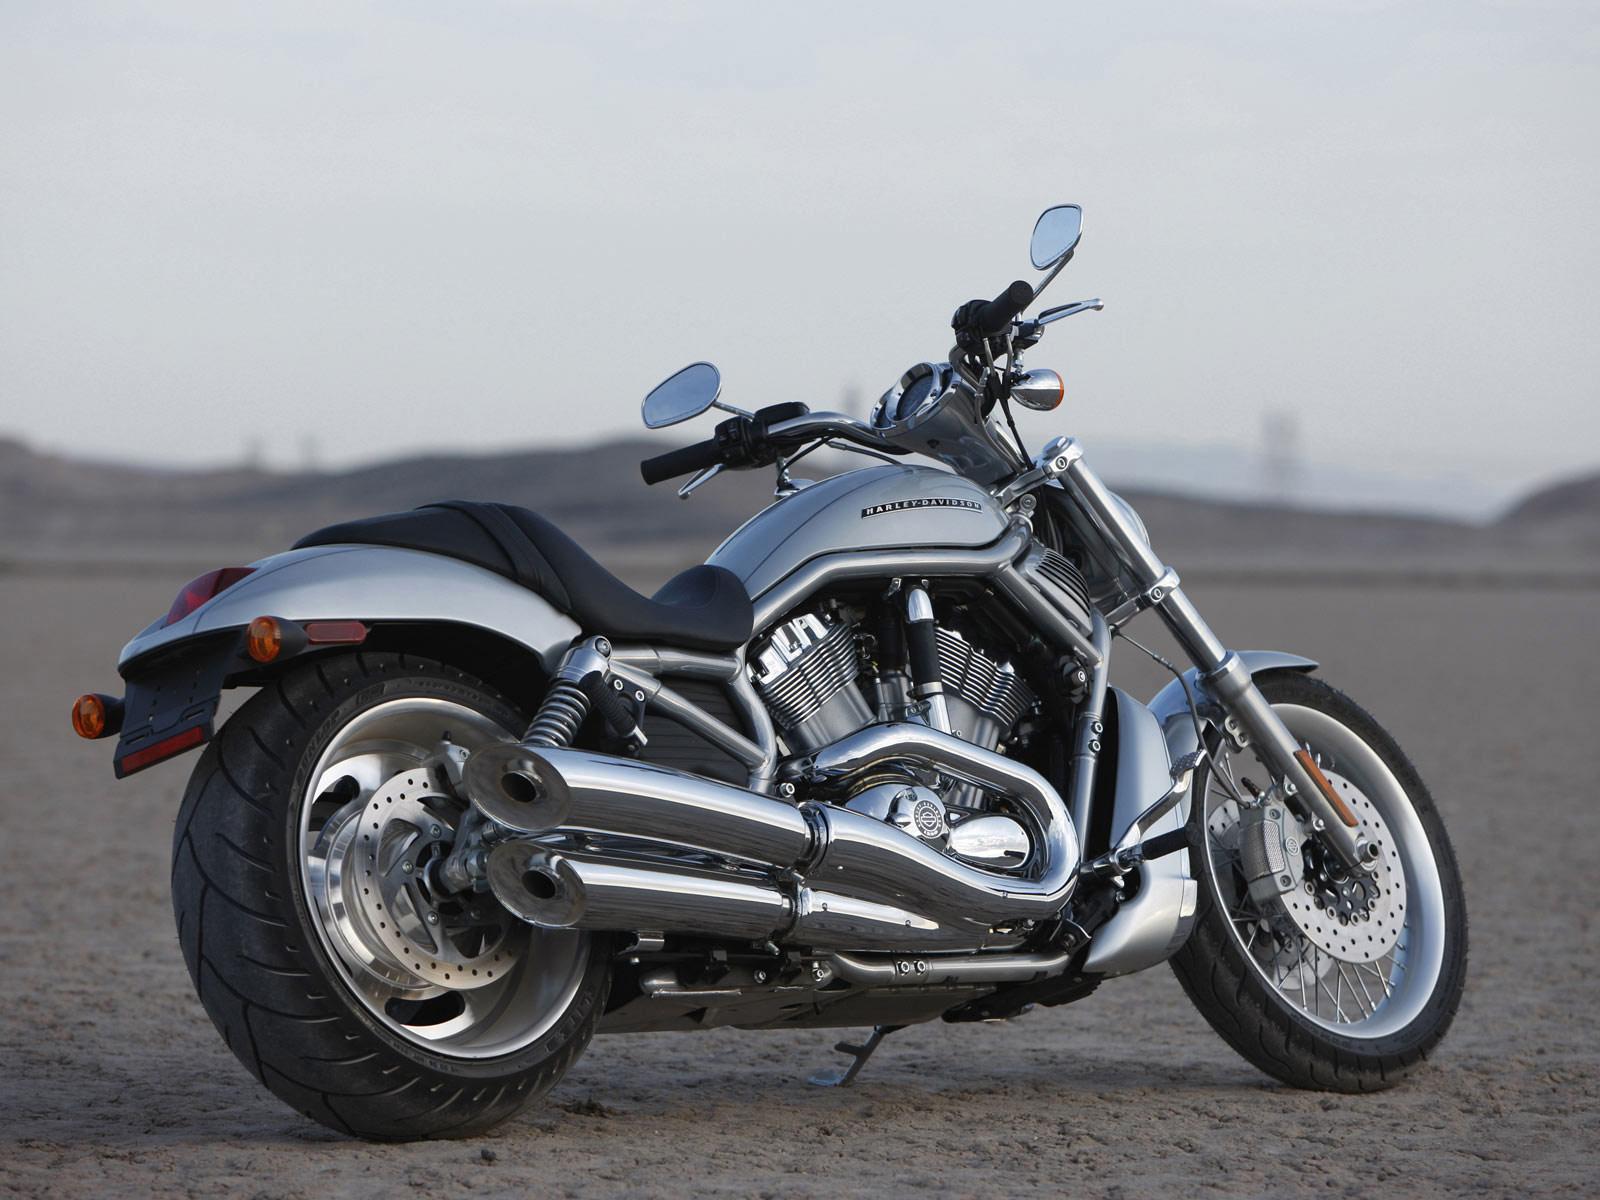 Harley Davidson V Rod Muscle Horsepower